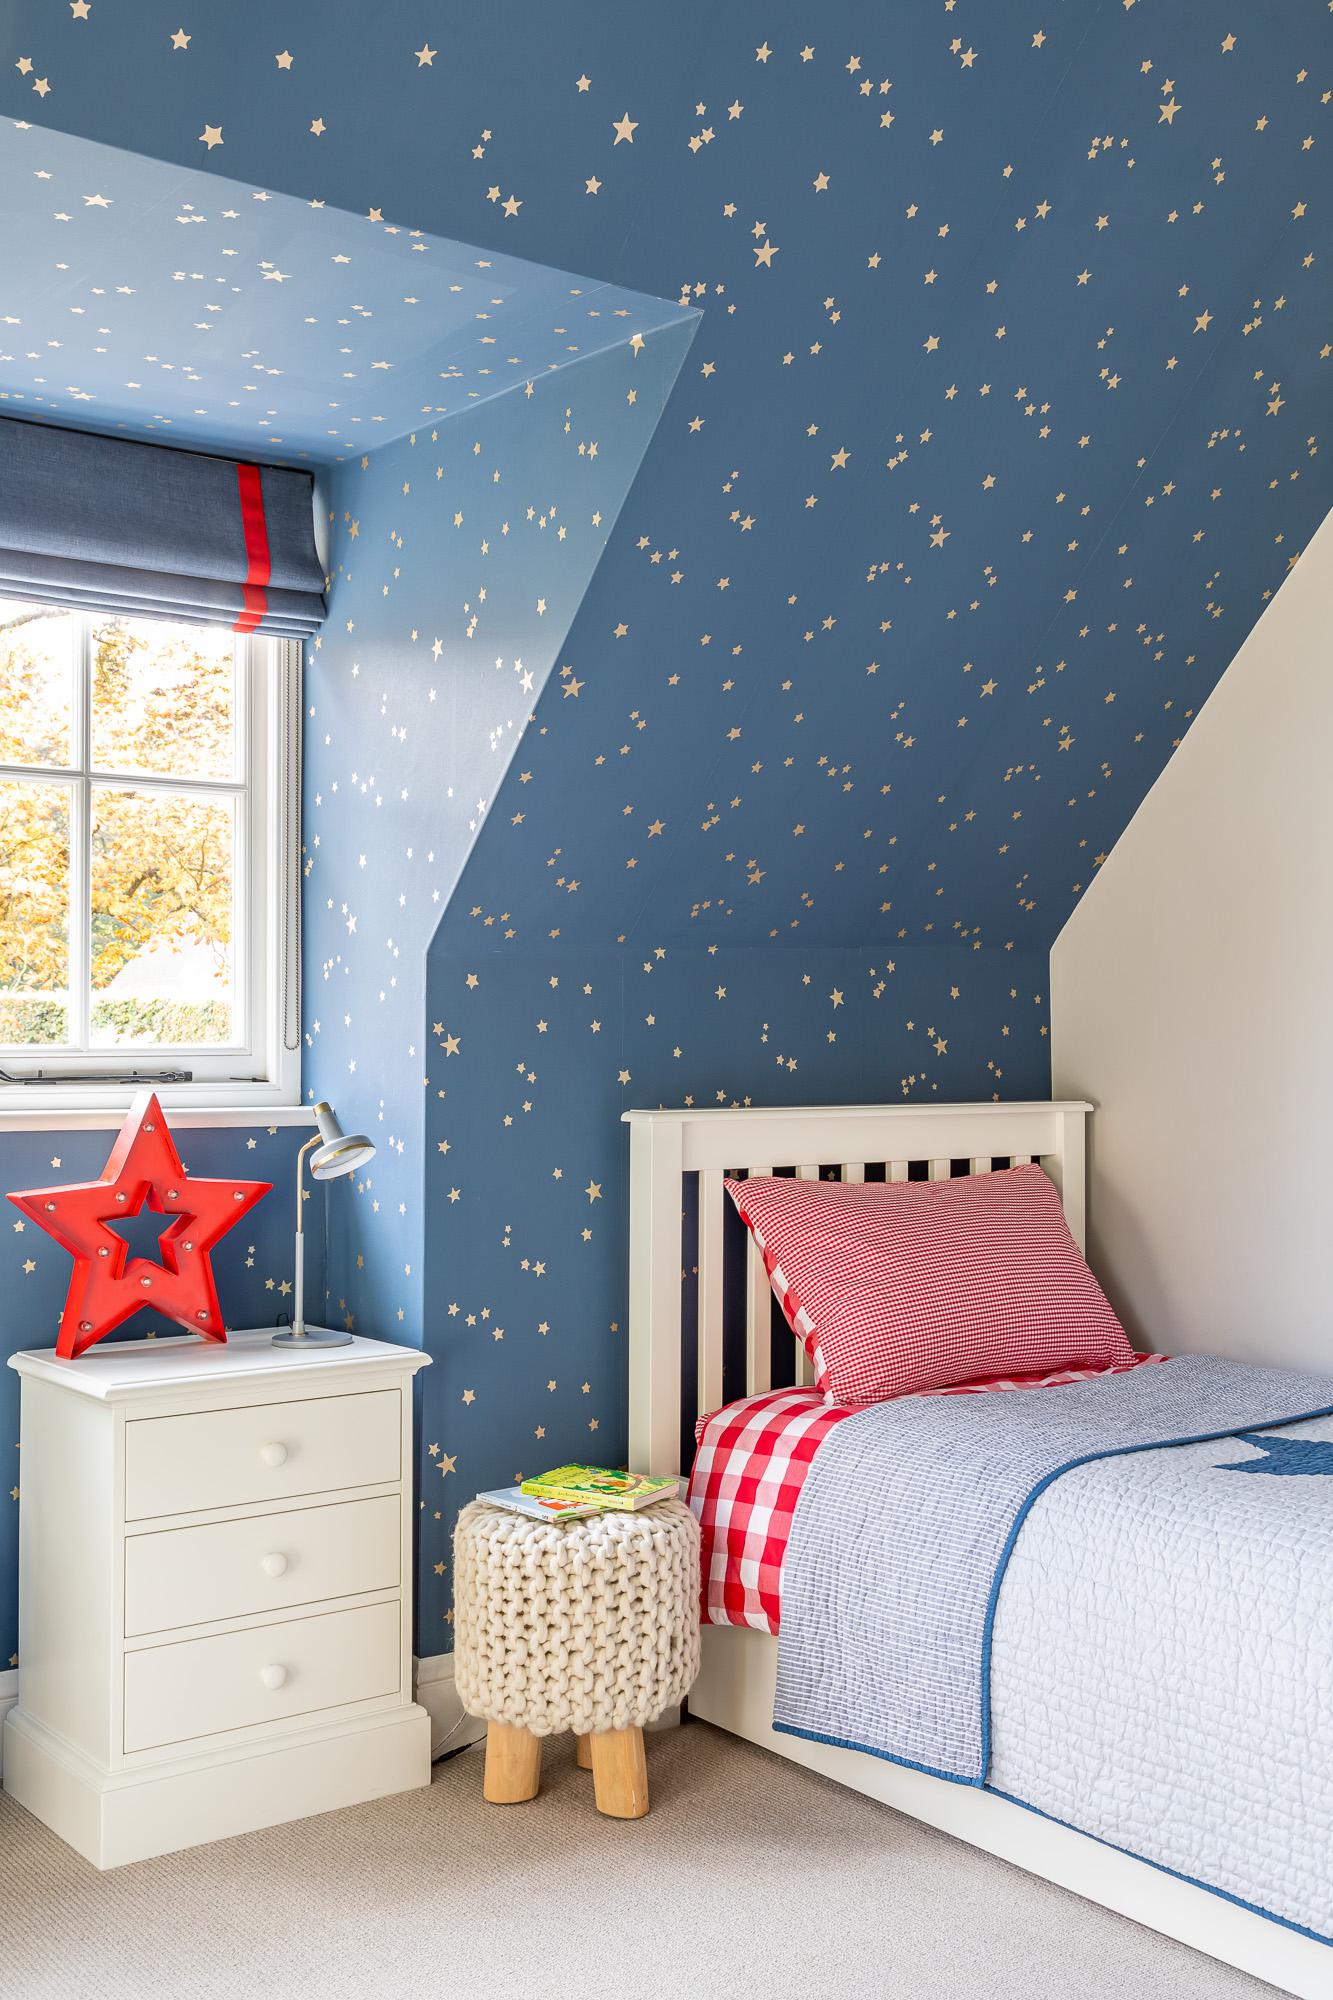 jonathan bond, interior photographer, single bed in childs bedroom, great missenden, buckinghamshire